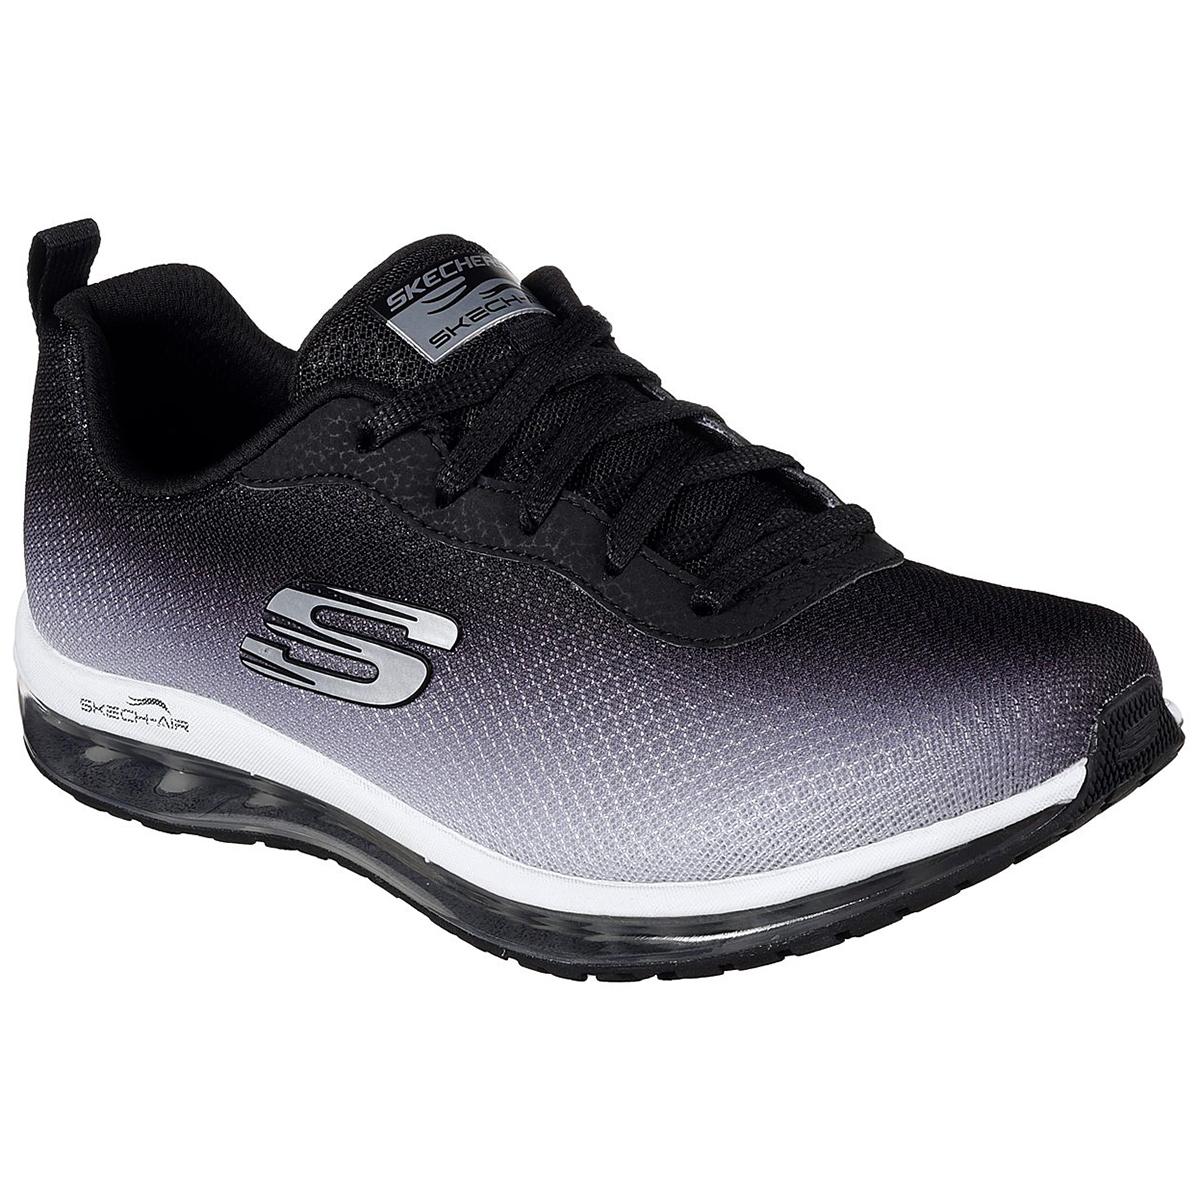 Skechers Women's Skech Air Element Sneakers - Black, 7.5